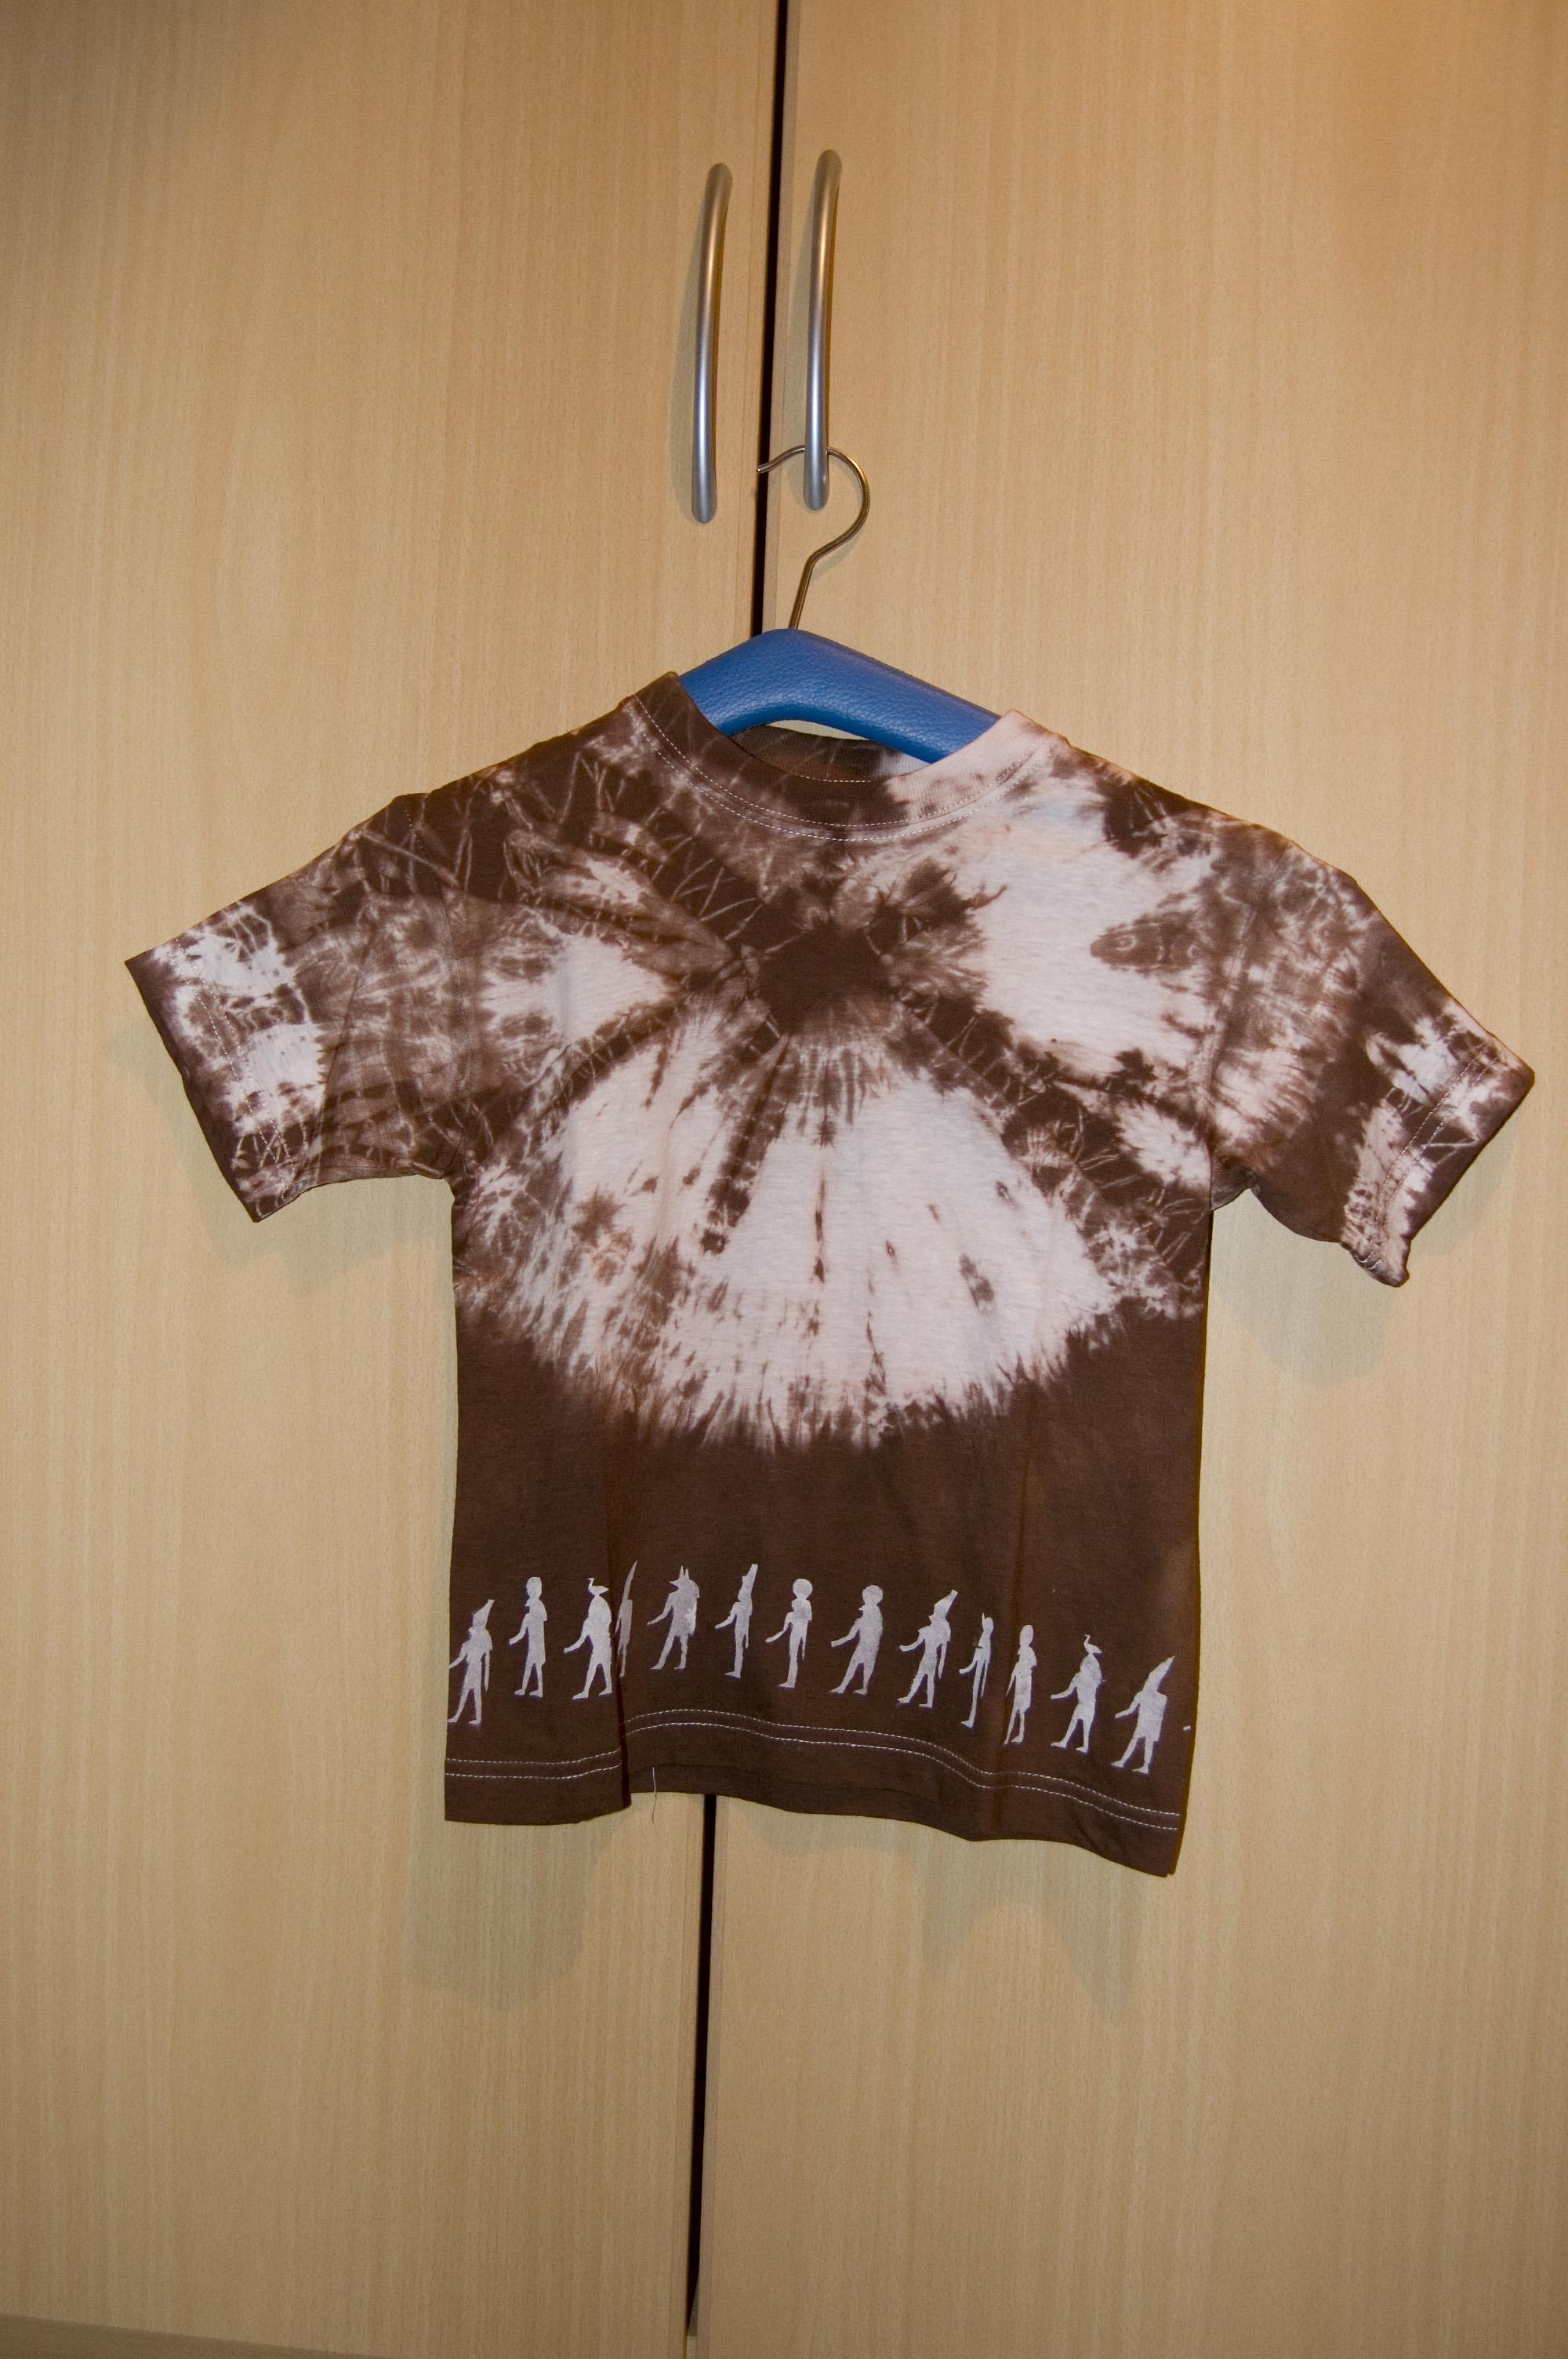 2012_DSC2457D trička vyr